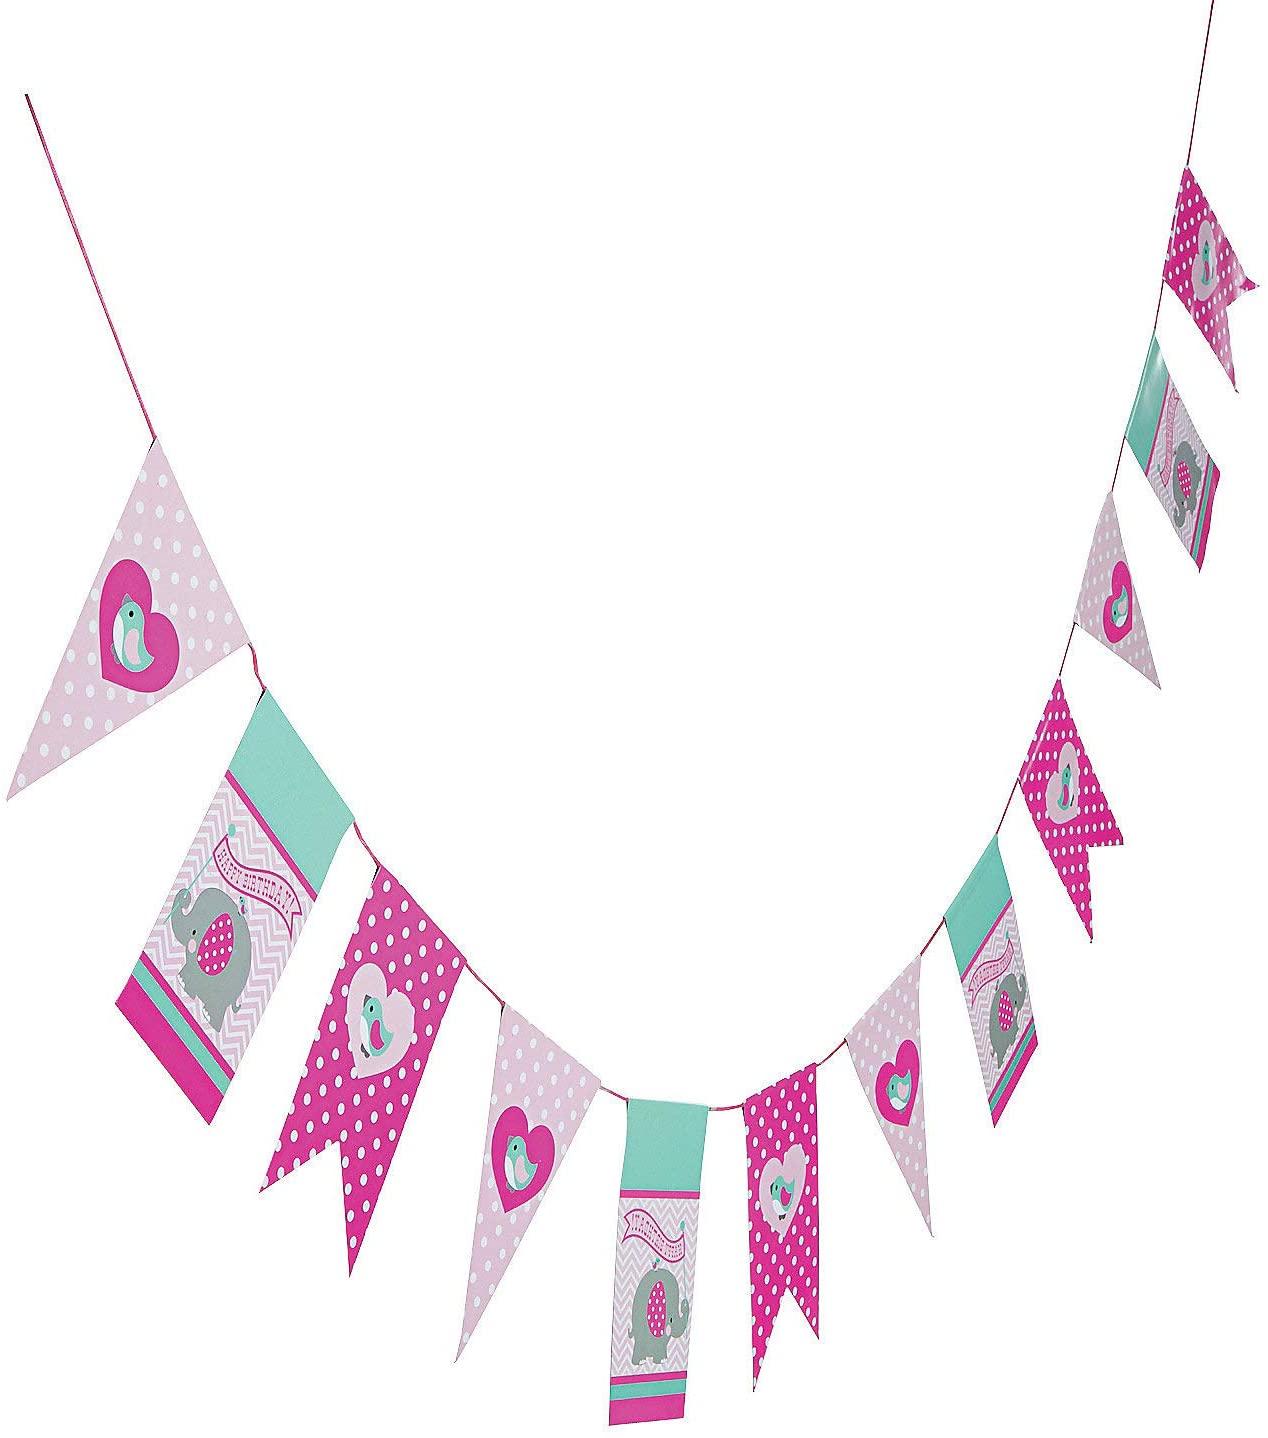 Fun Express - 1st Pink Elephant Birthday Garland for Birthday - Party Decor - Hanging Decor - Garland - Birthday - 1 Piece